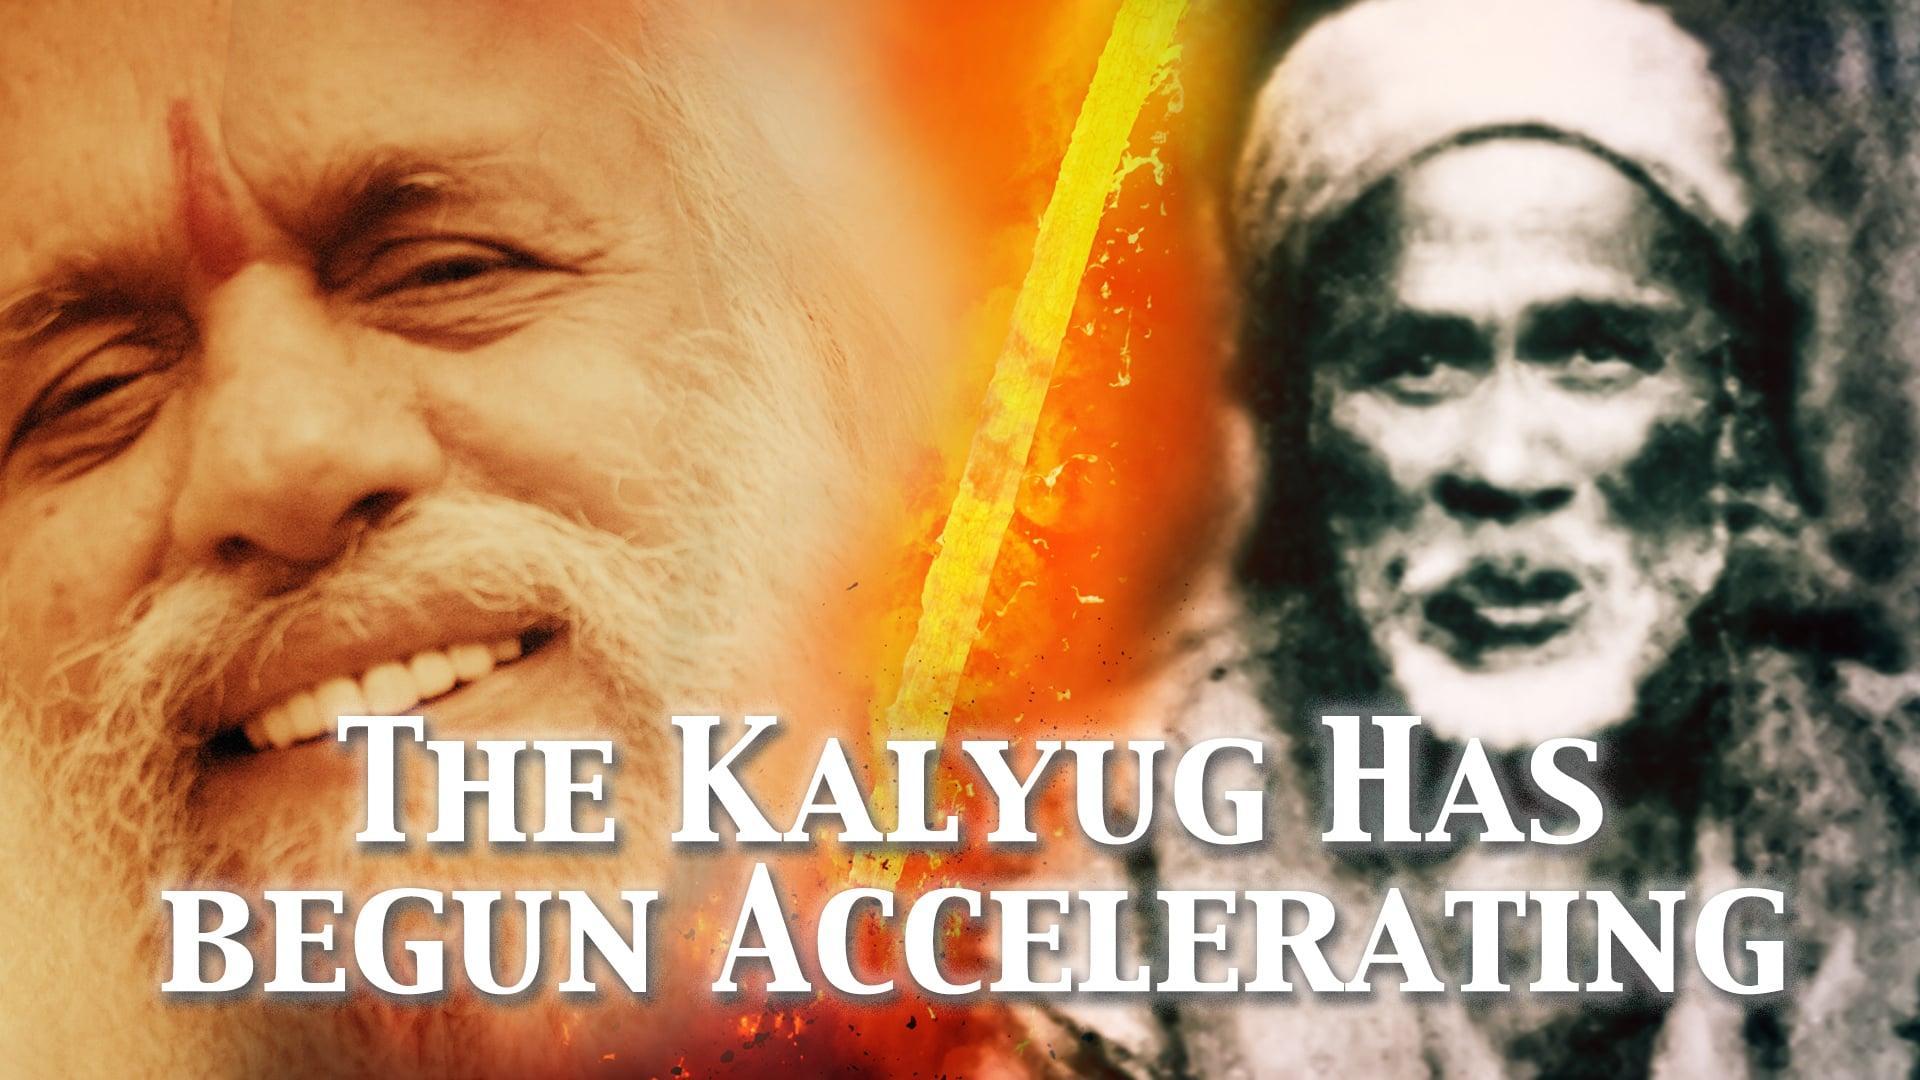 The Kalyug has begun accelerating